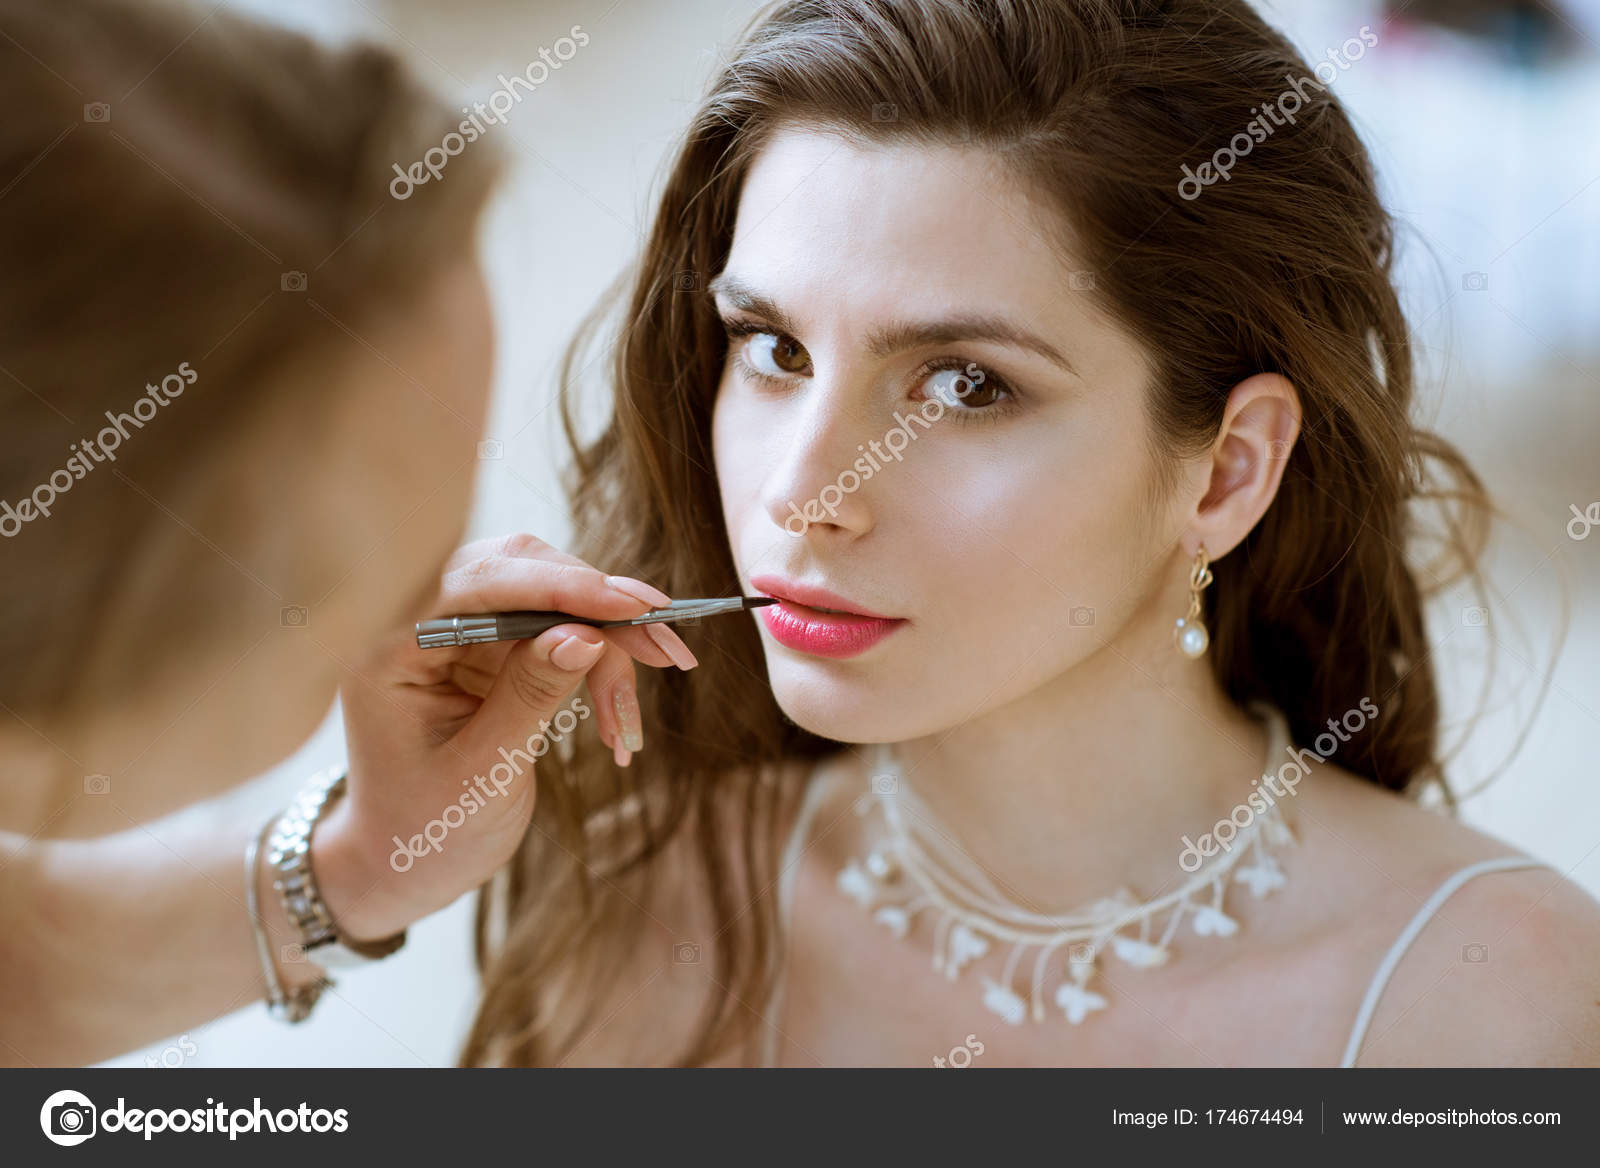 Arabic Makeup Bridal Wedding Makeup Artist Making A Make